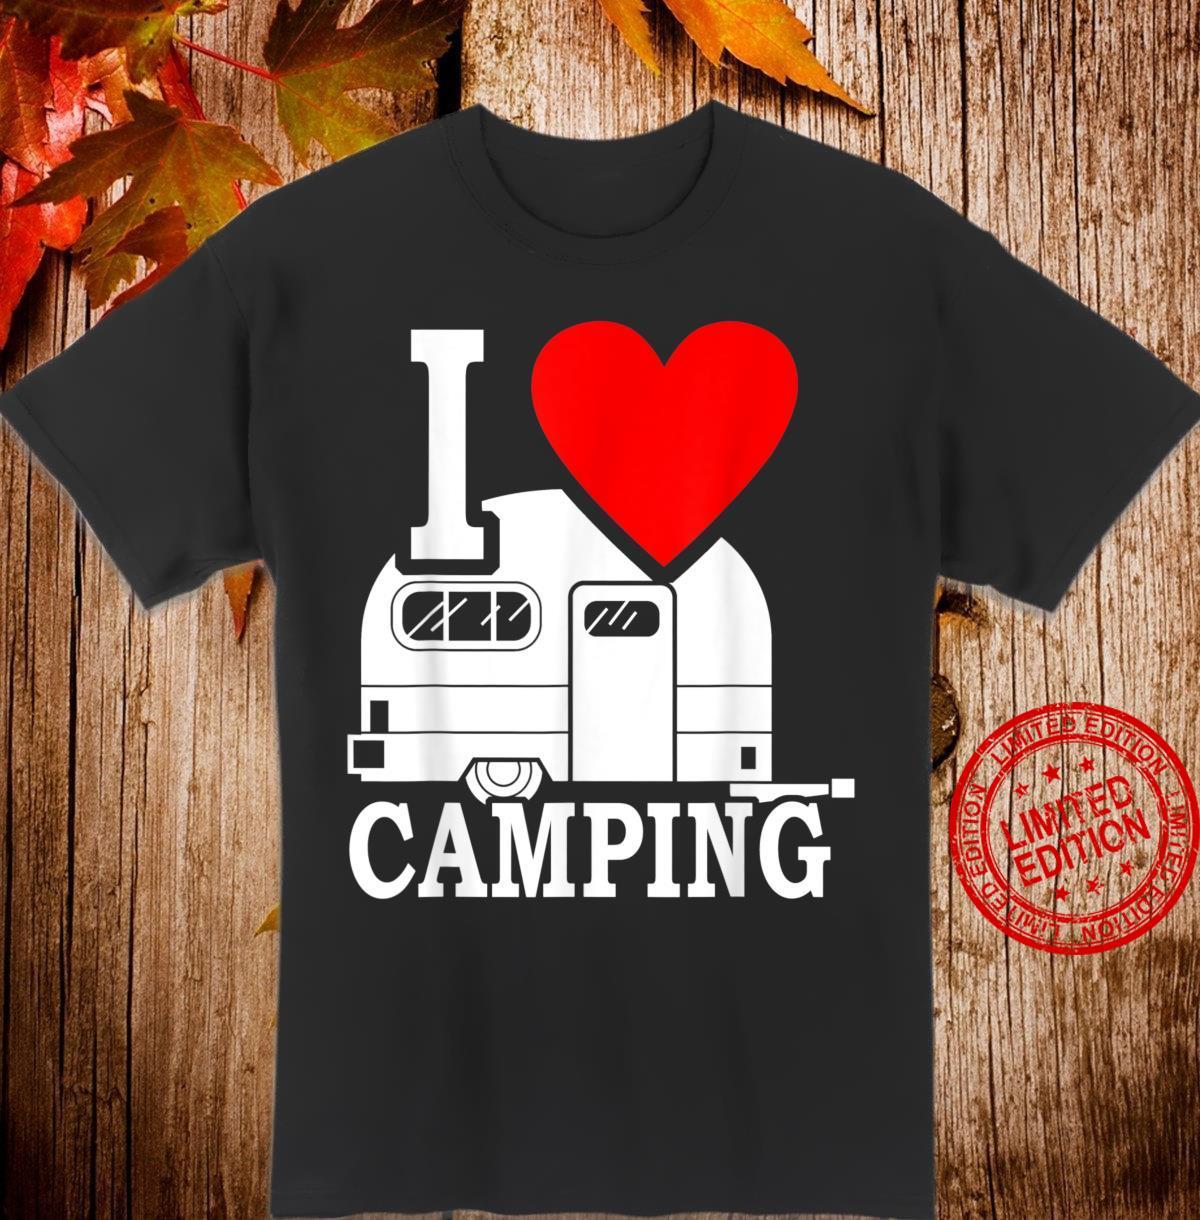 I Love Camping Geschenk Männer Campingzubehör Wohnanhänger Shirt